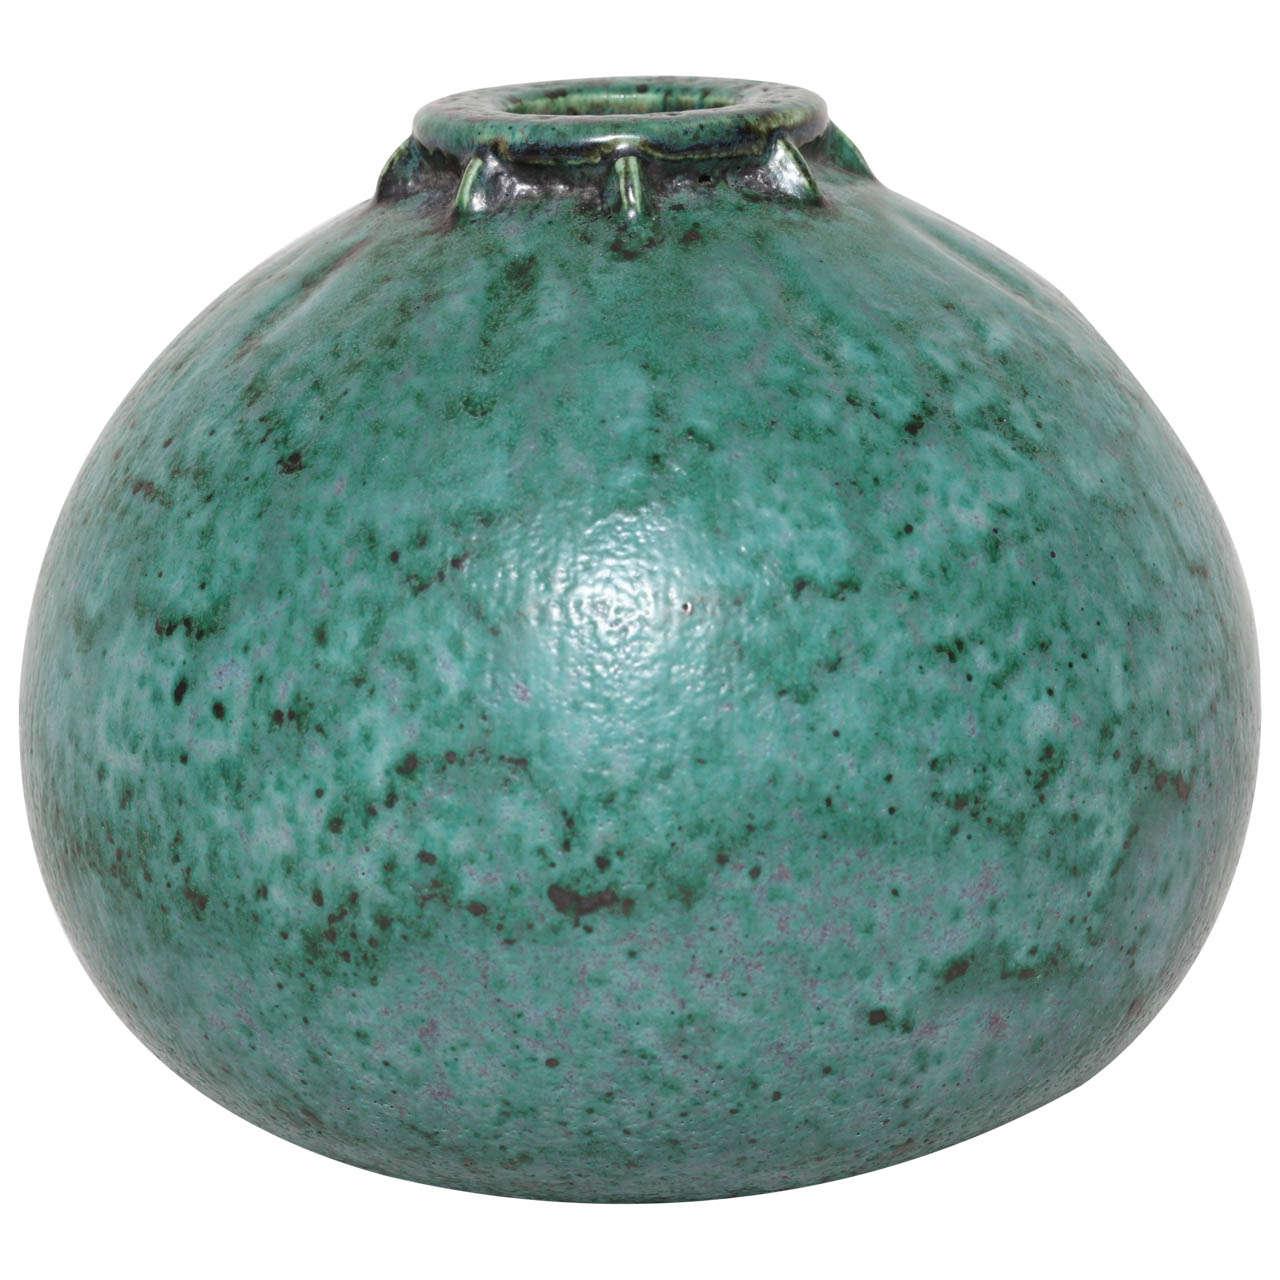 Emile Decoeur French Art Deco Turquoise Stoneware Vase For Sale